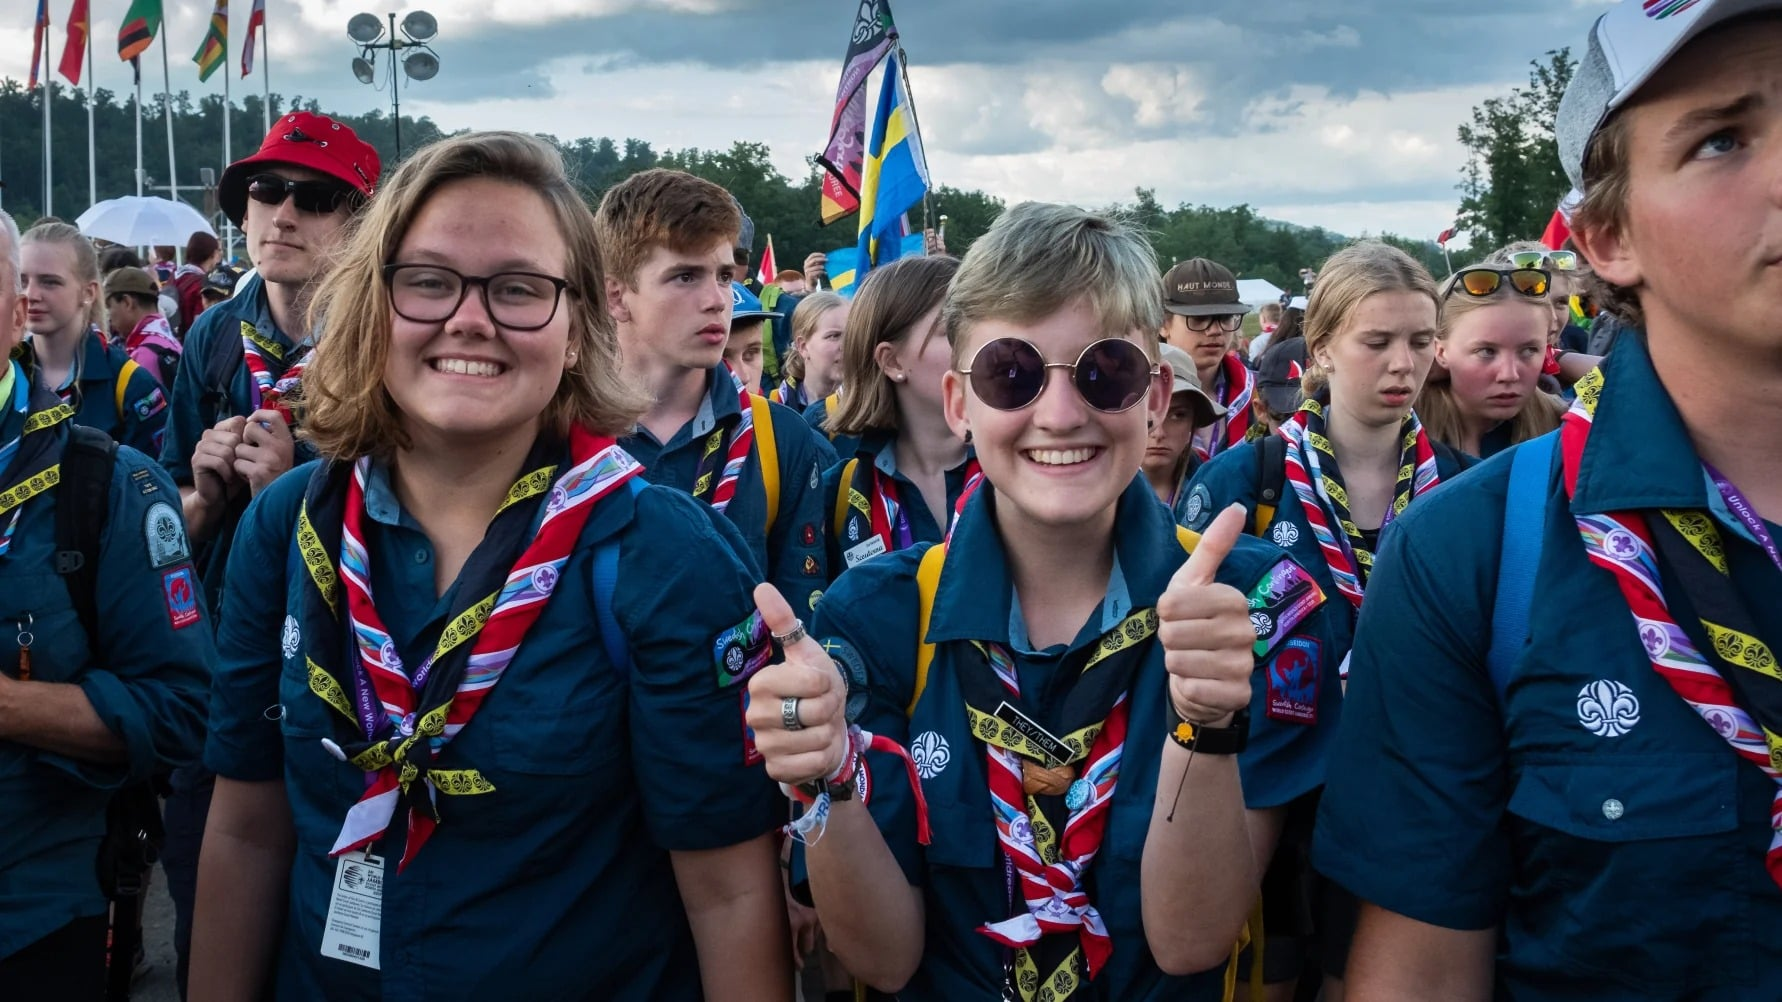 Svenska scouter på World Scout Jamboree i USA